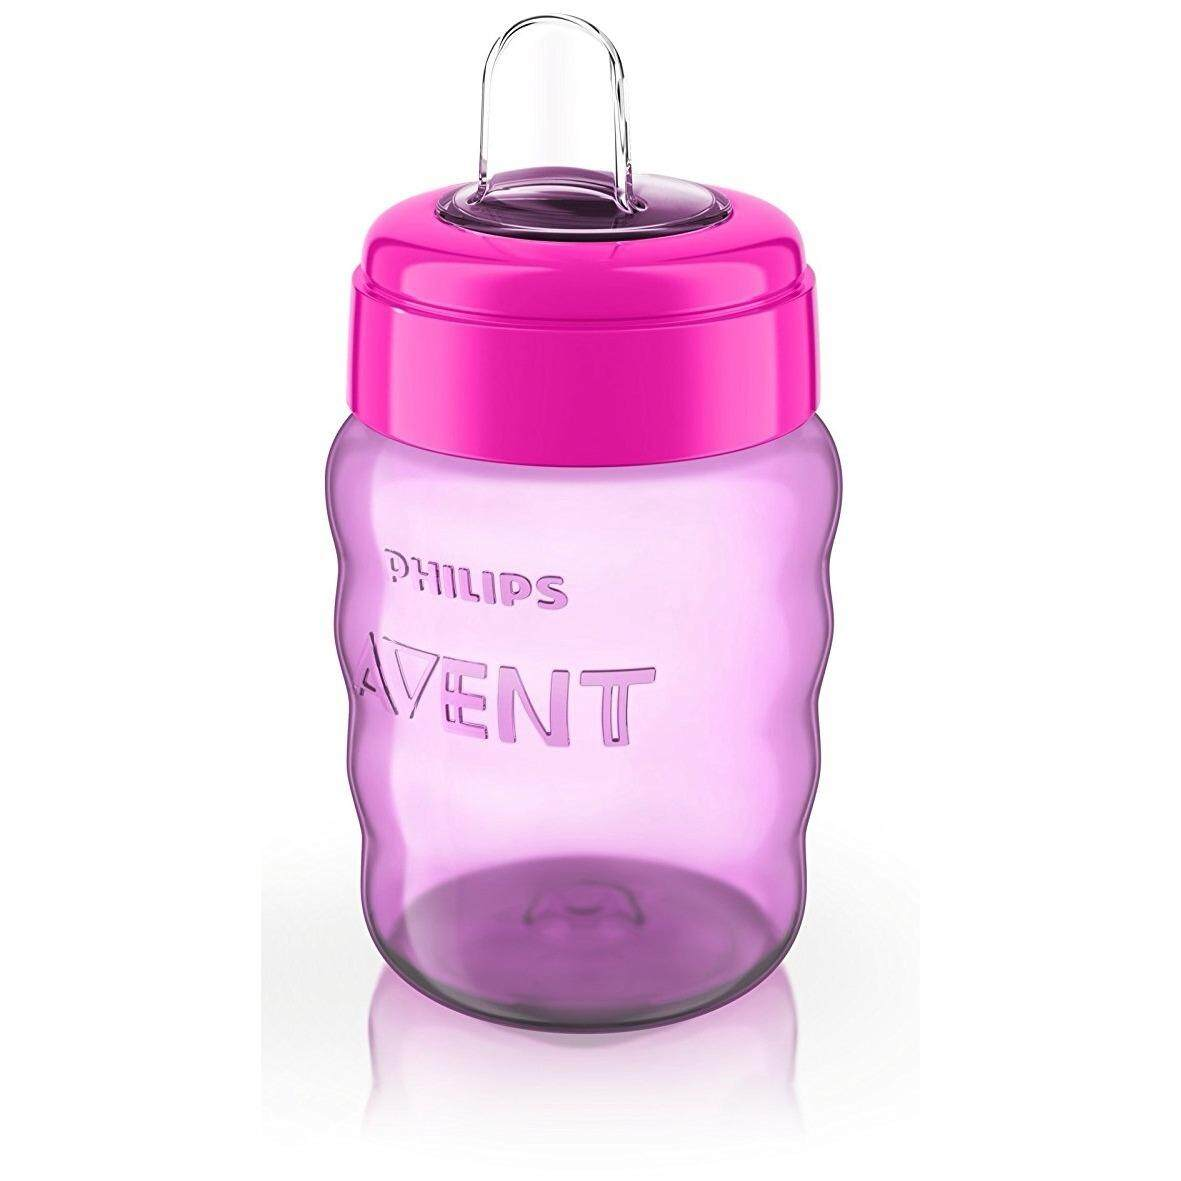 Philips Avent Classic Spout Cup 260ml Pink / Purple  SCF553/00